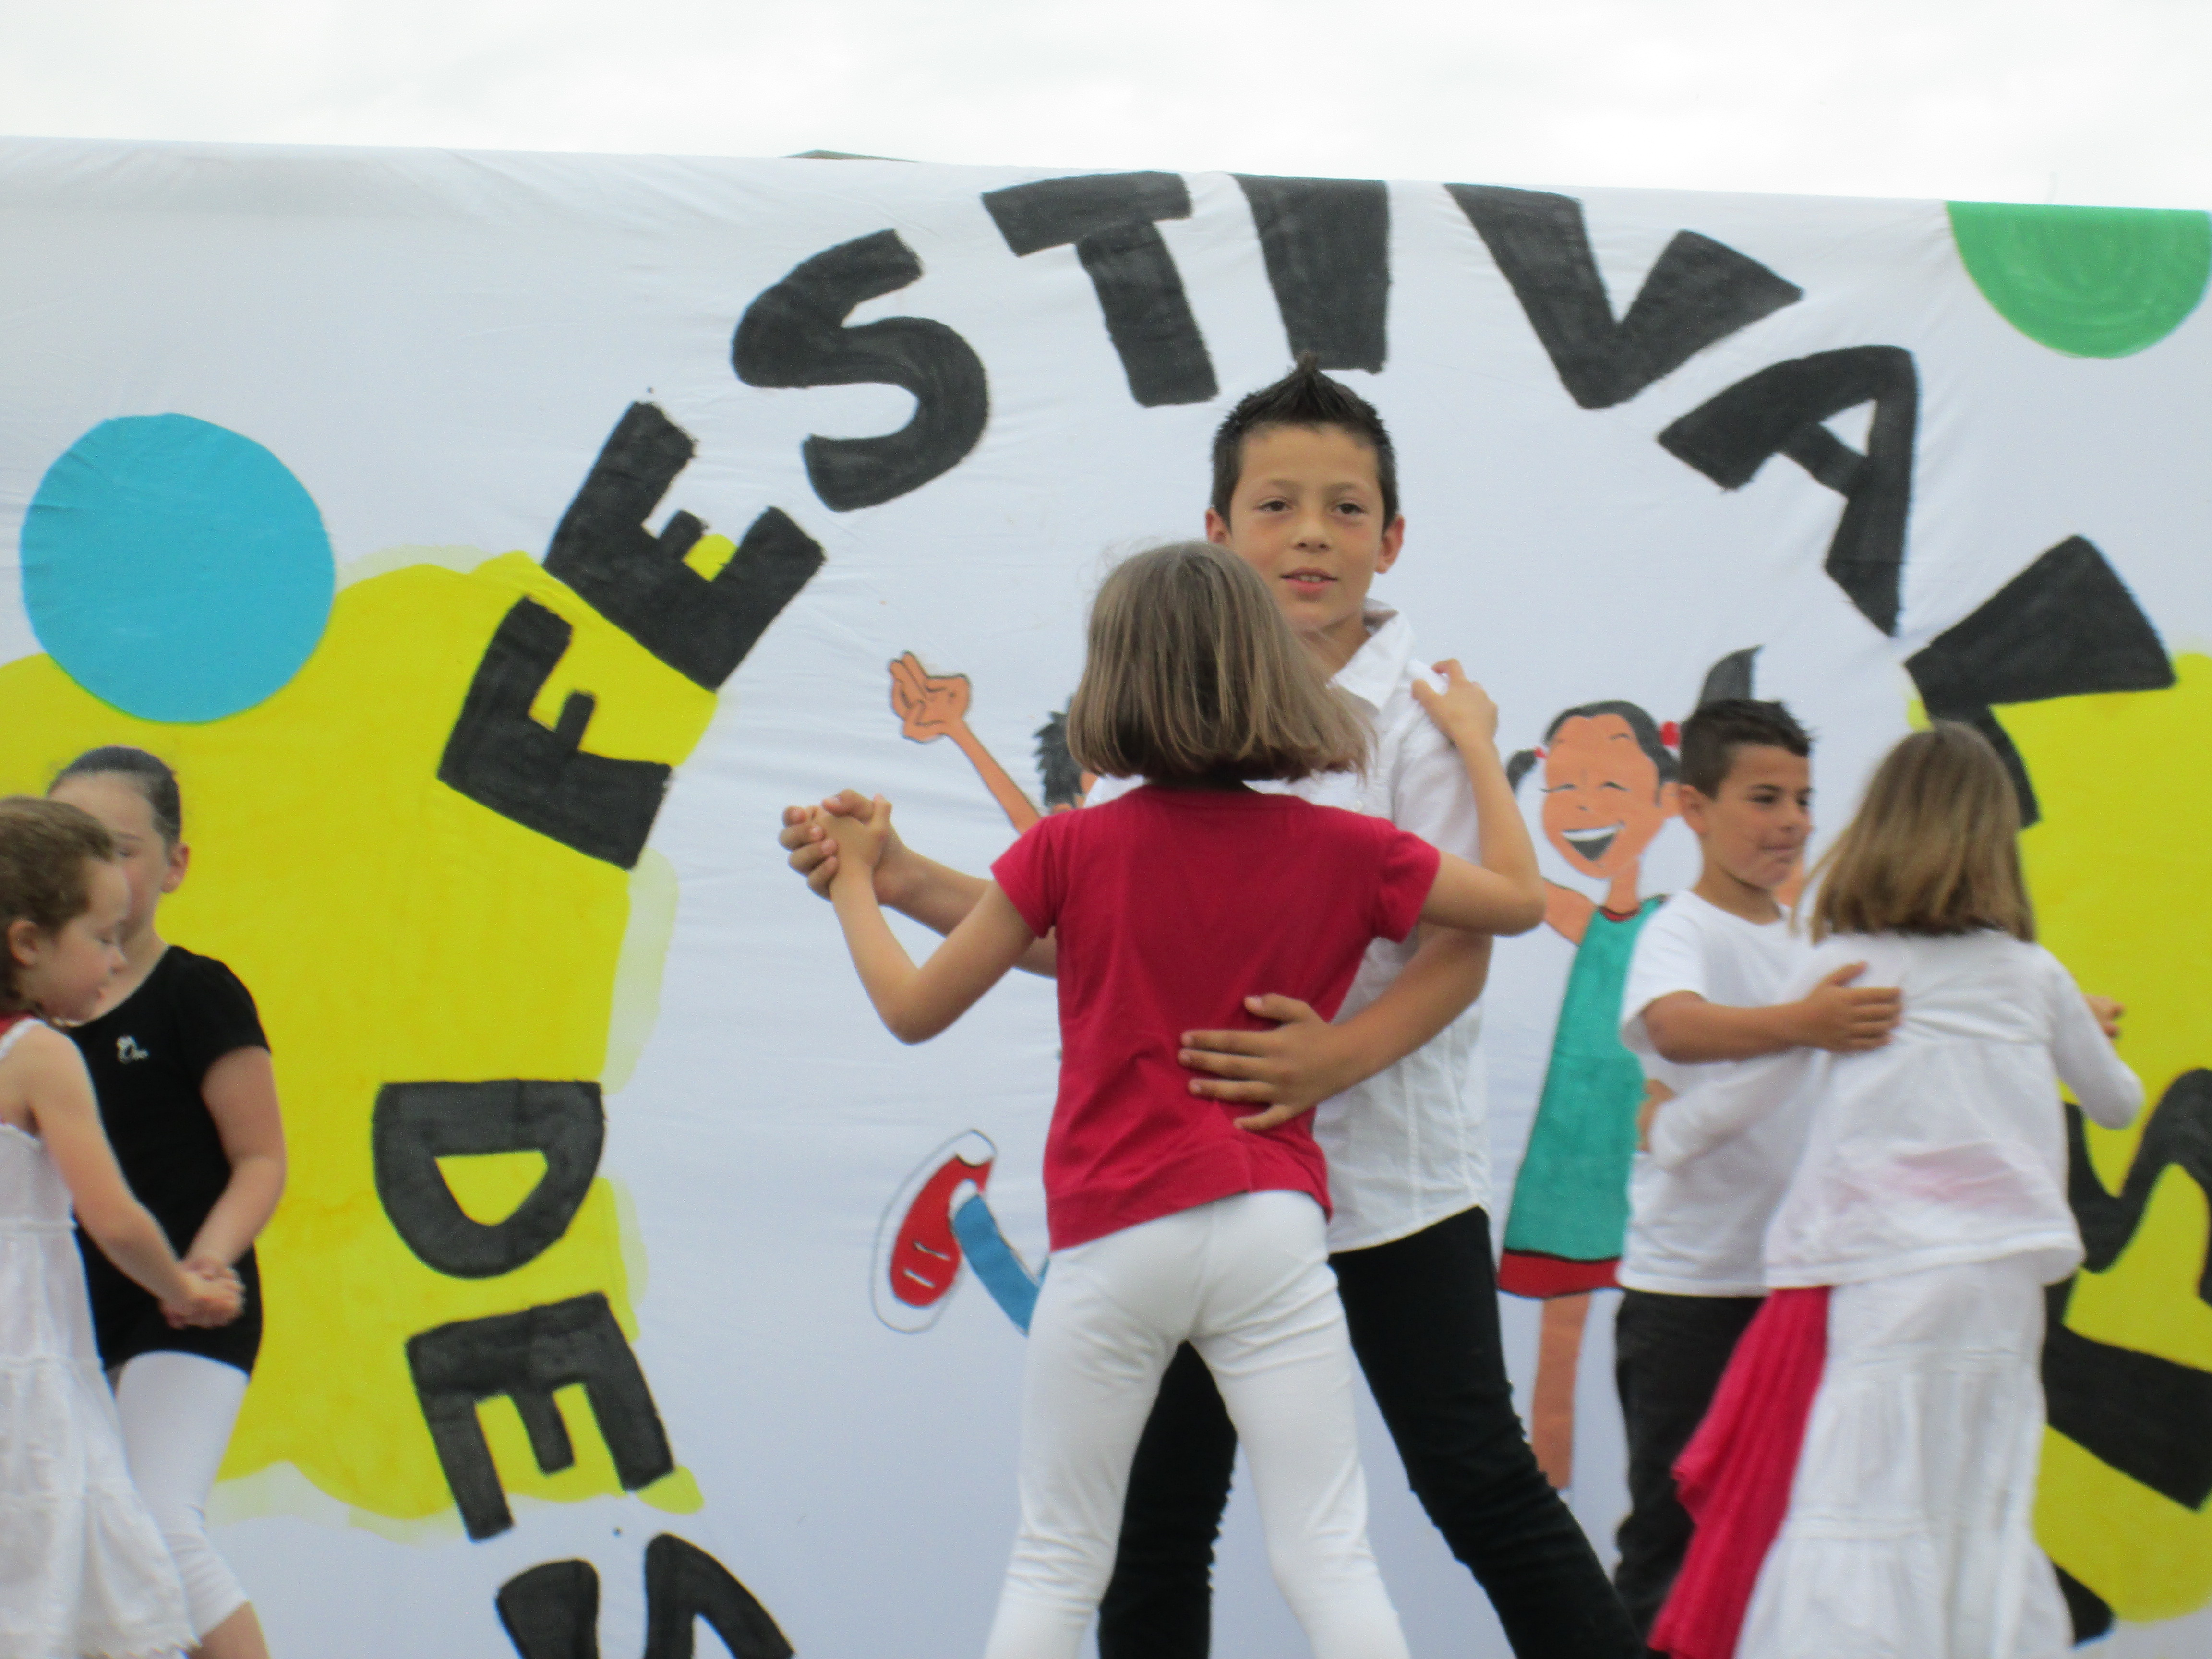 Festival des enfants 2014